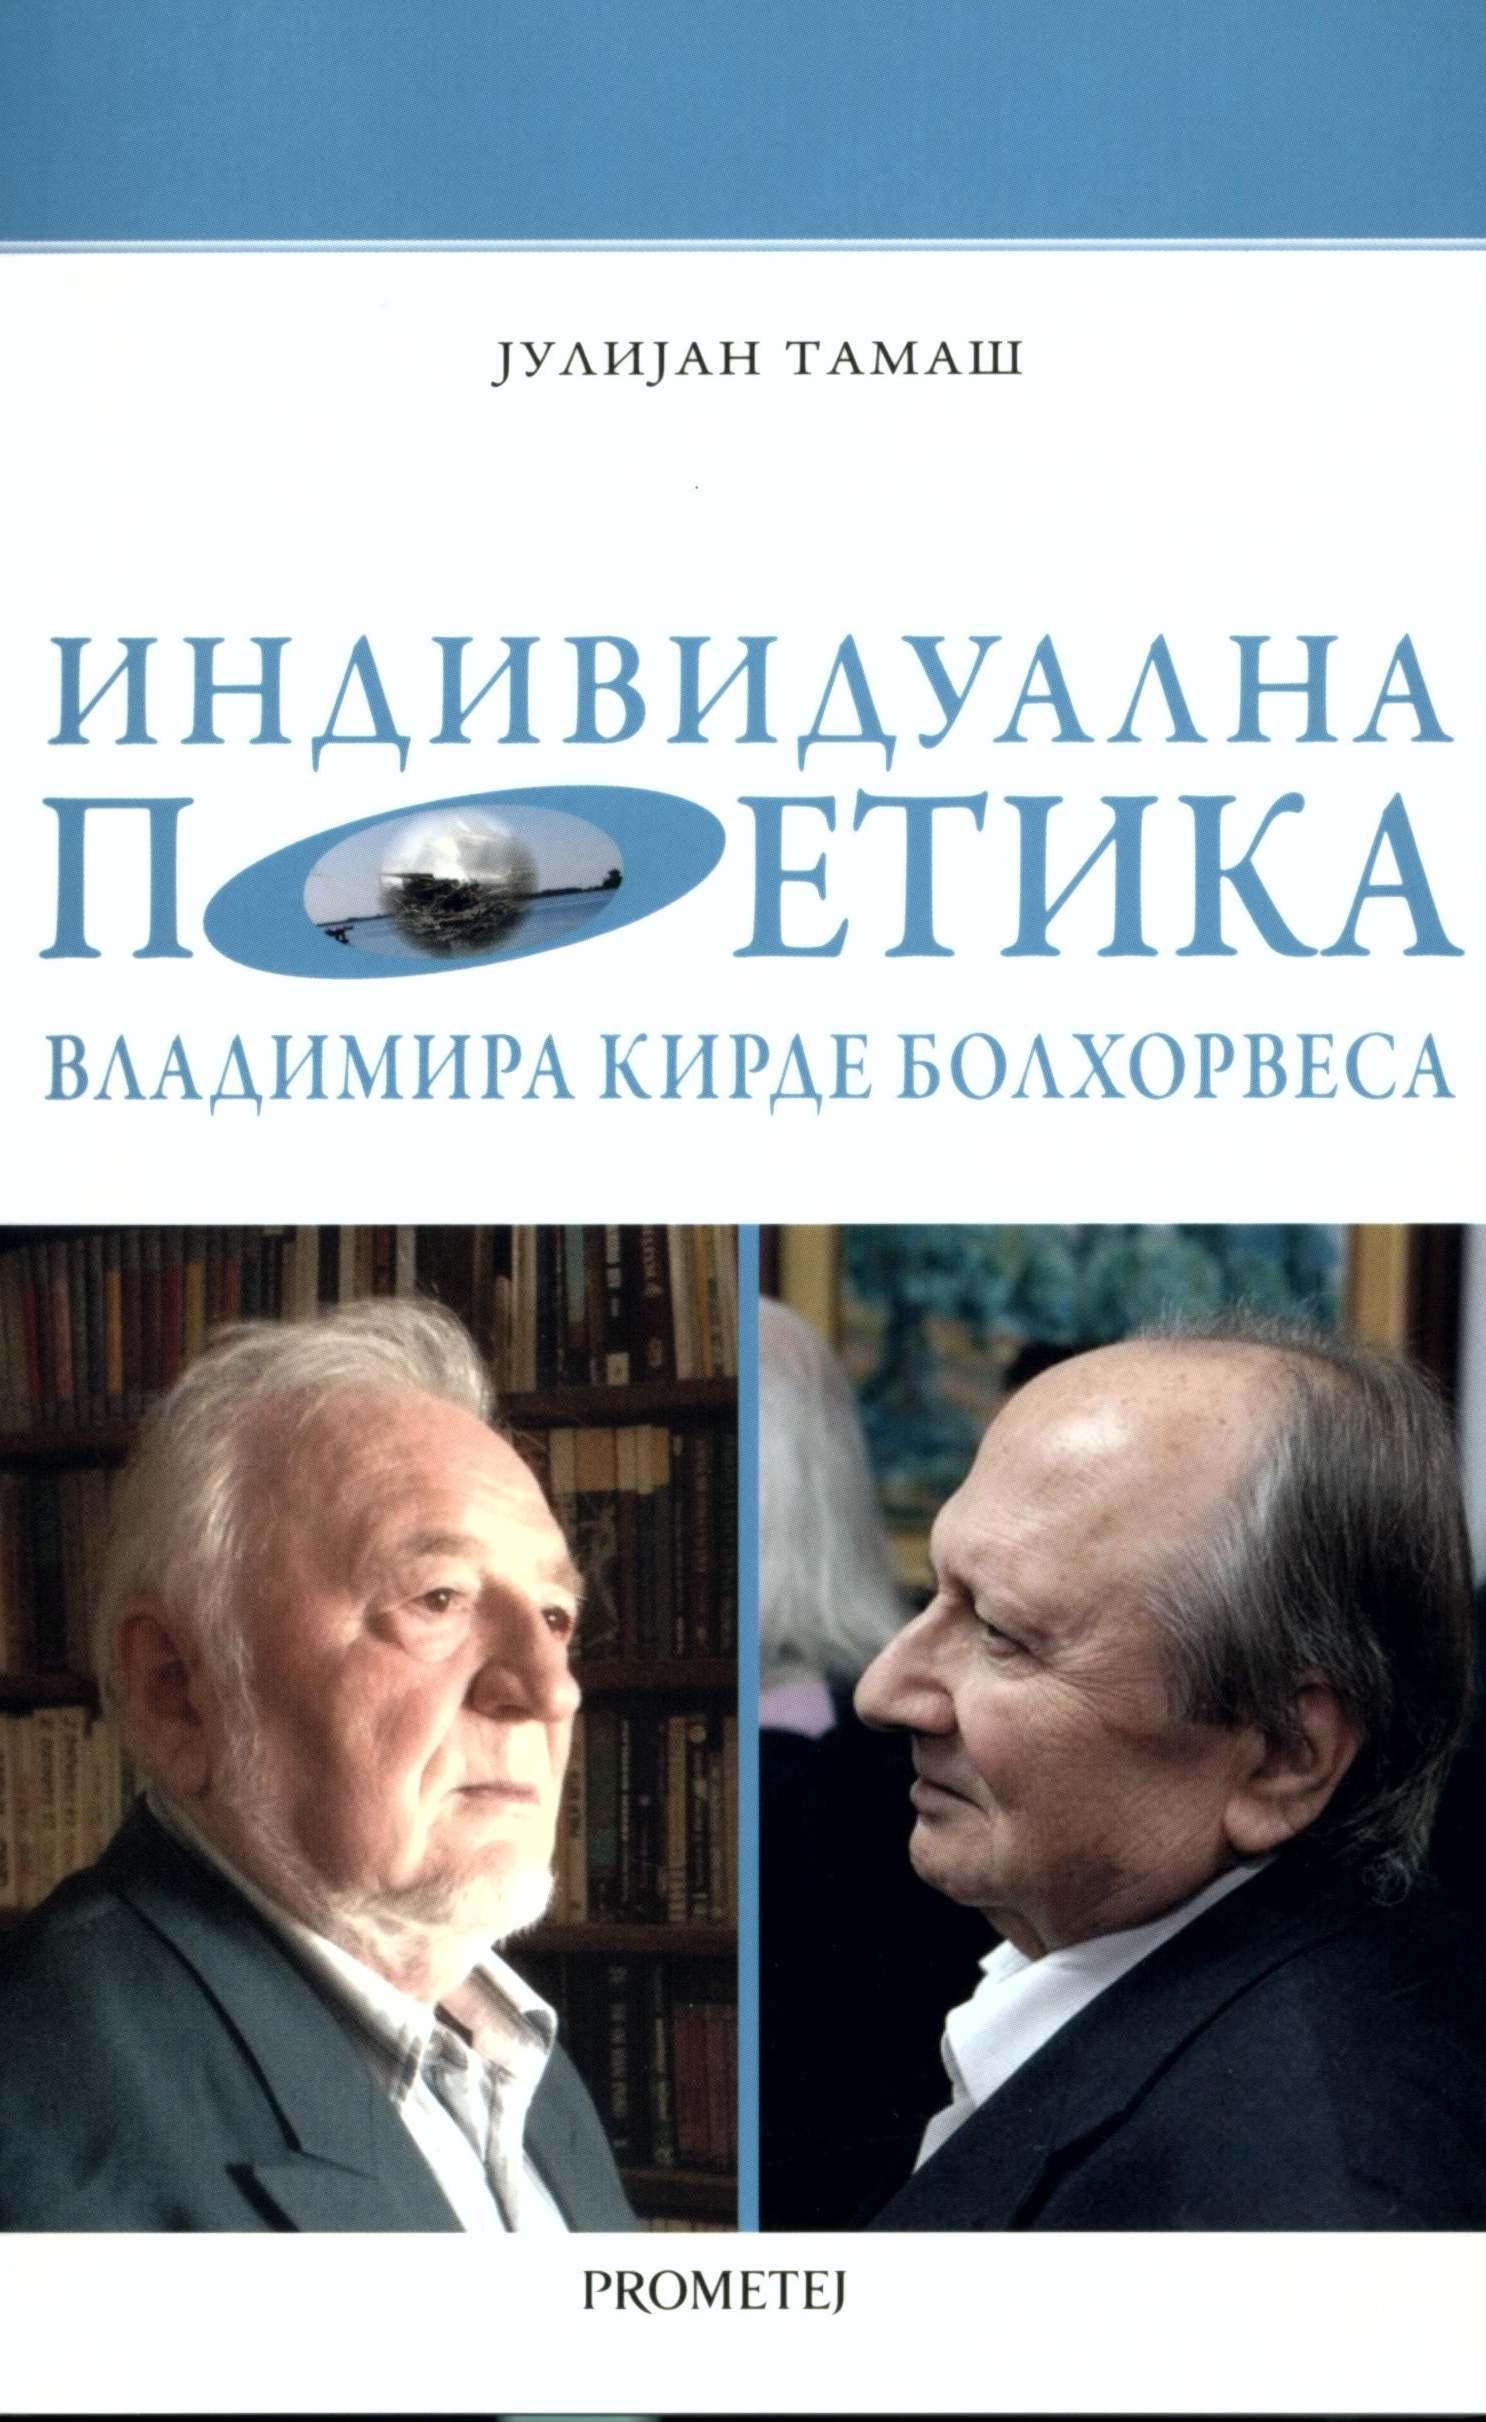 Individualna poetika Vladimira Kirde Bolhorvesa